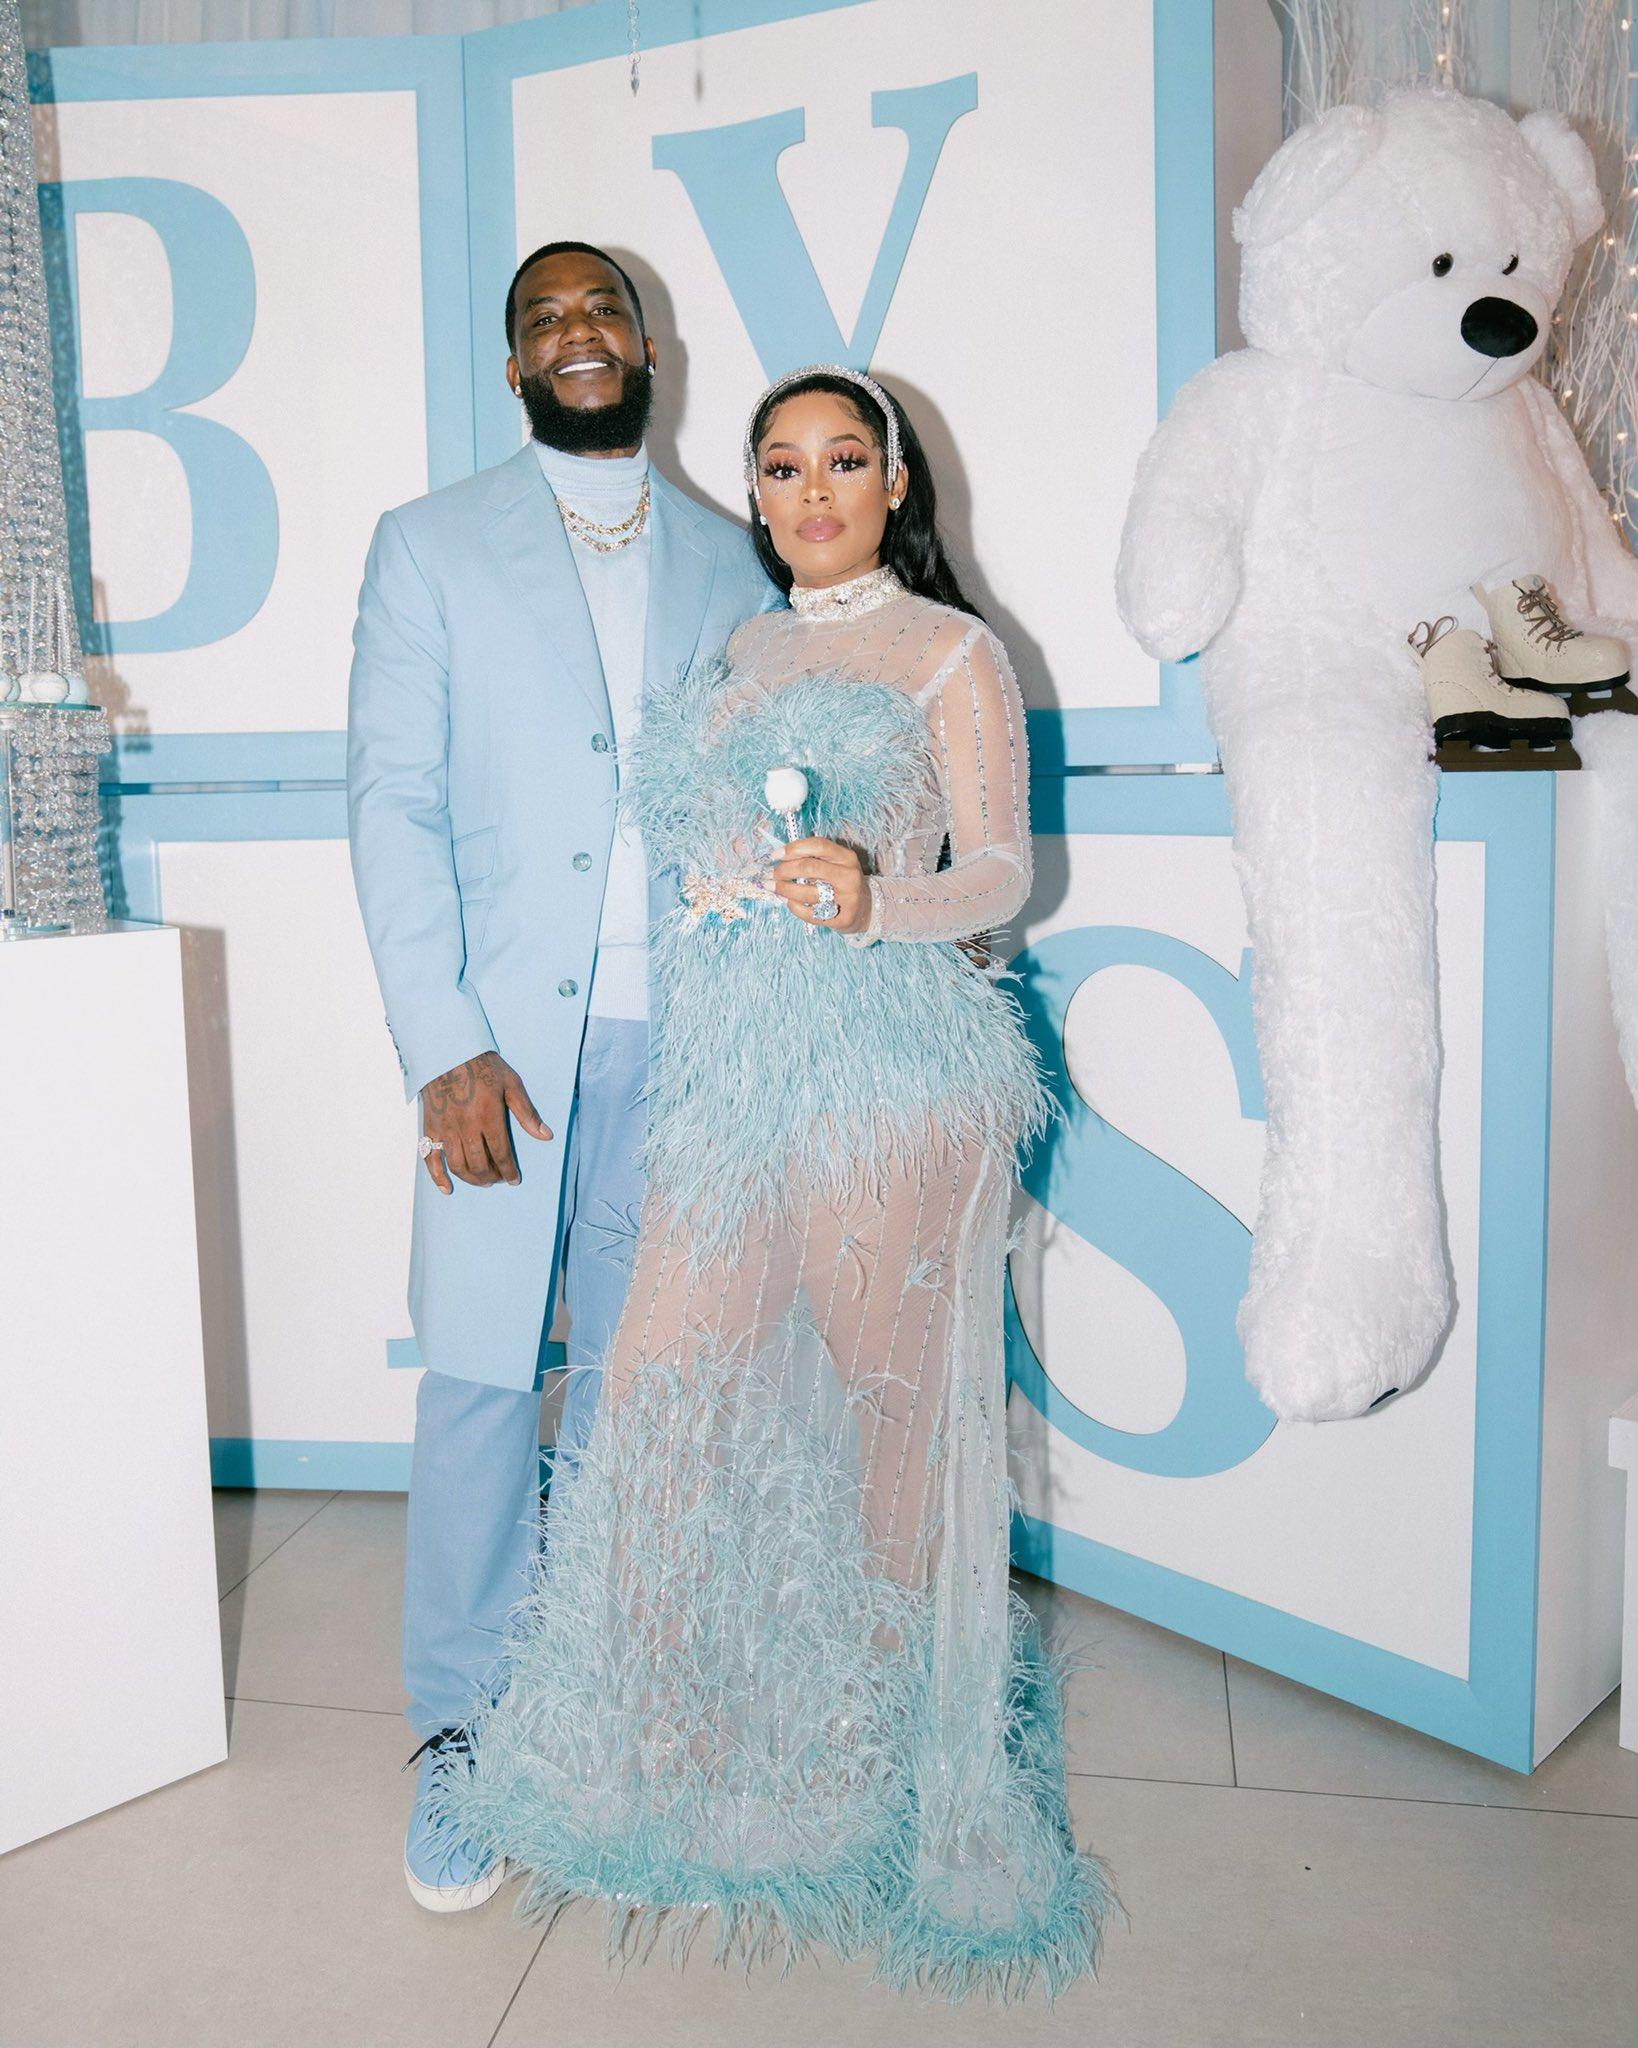 Gucci Mane & Wife Keyshia Ka'oir Have Welcomed their Baby Boy